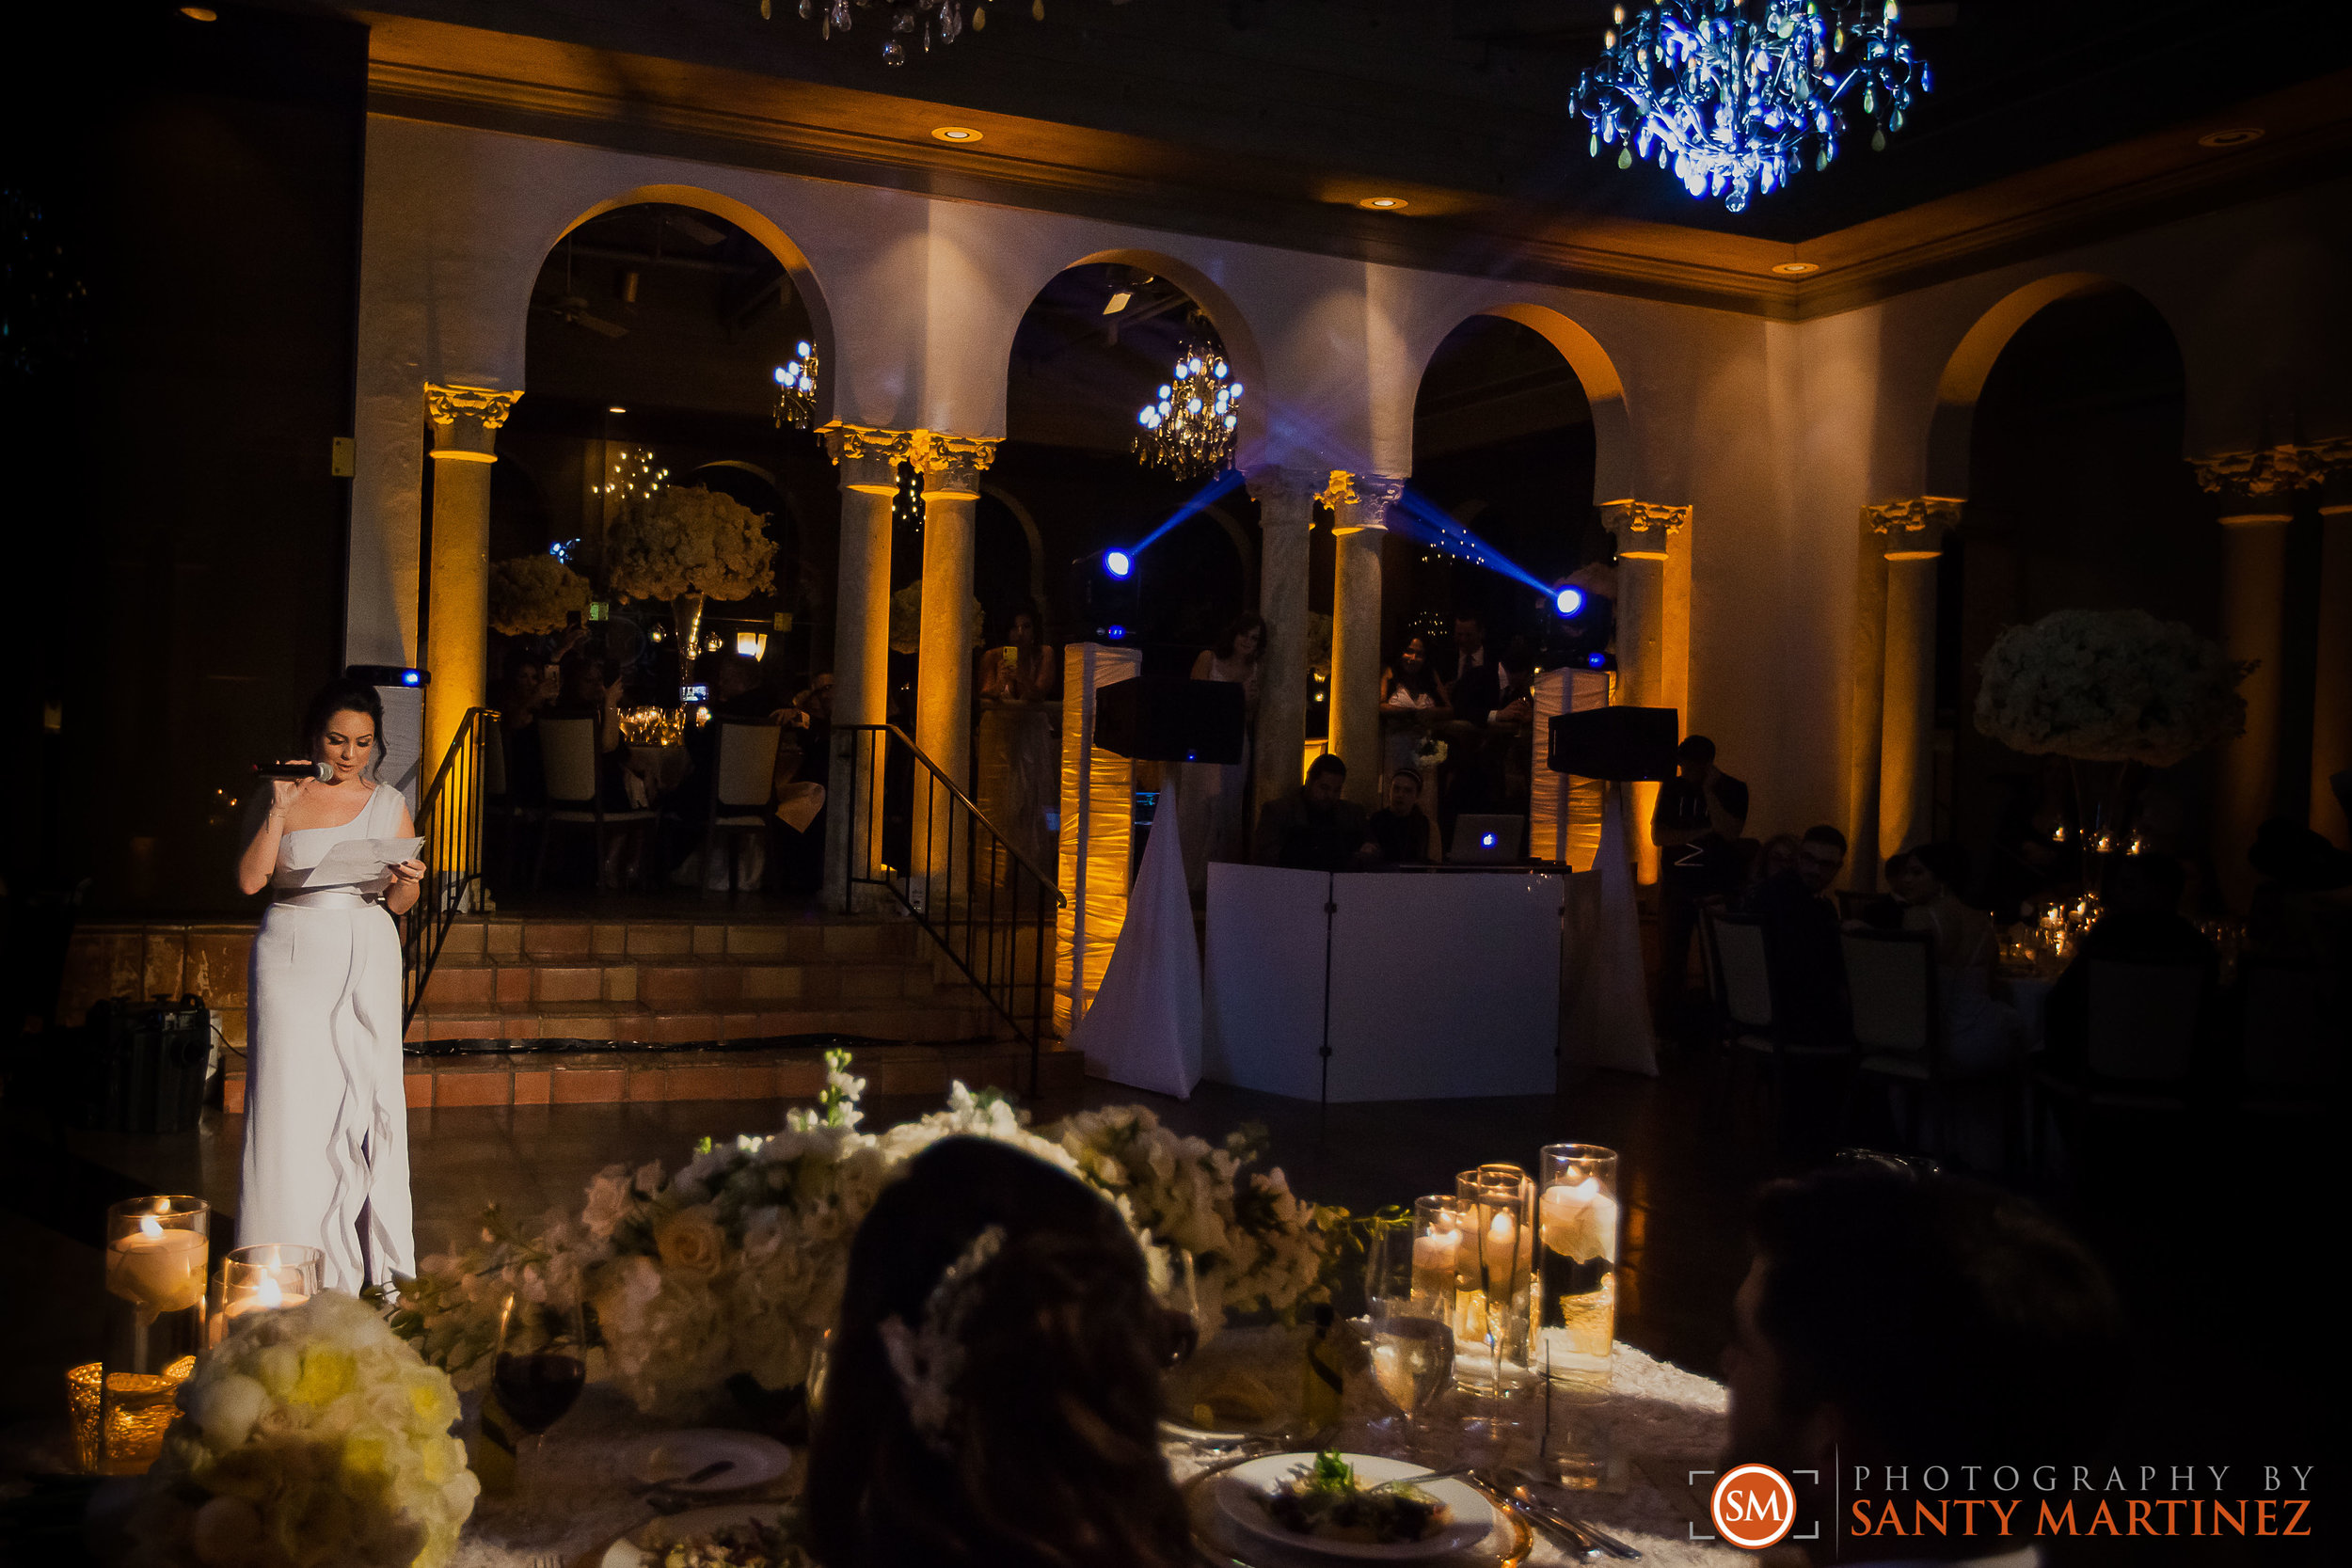 Wedding Coral Gables Country Club - Santy Martinez Photography-46.jpg